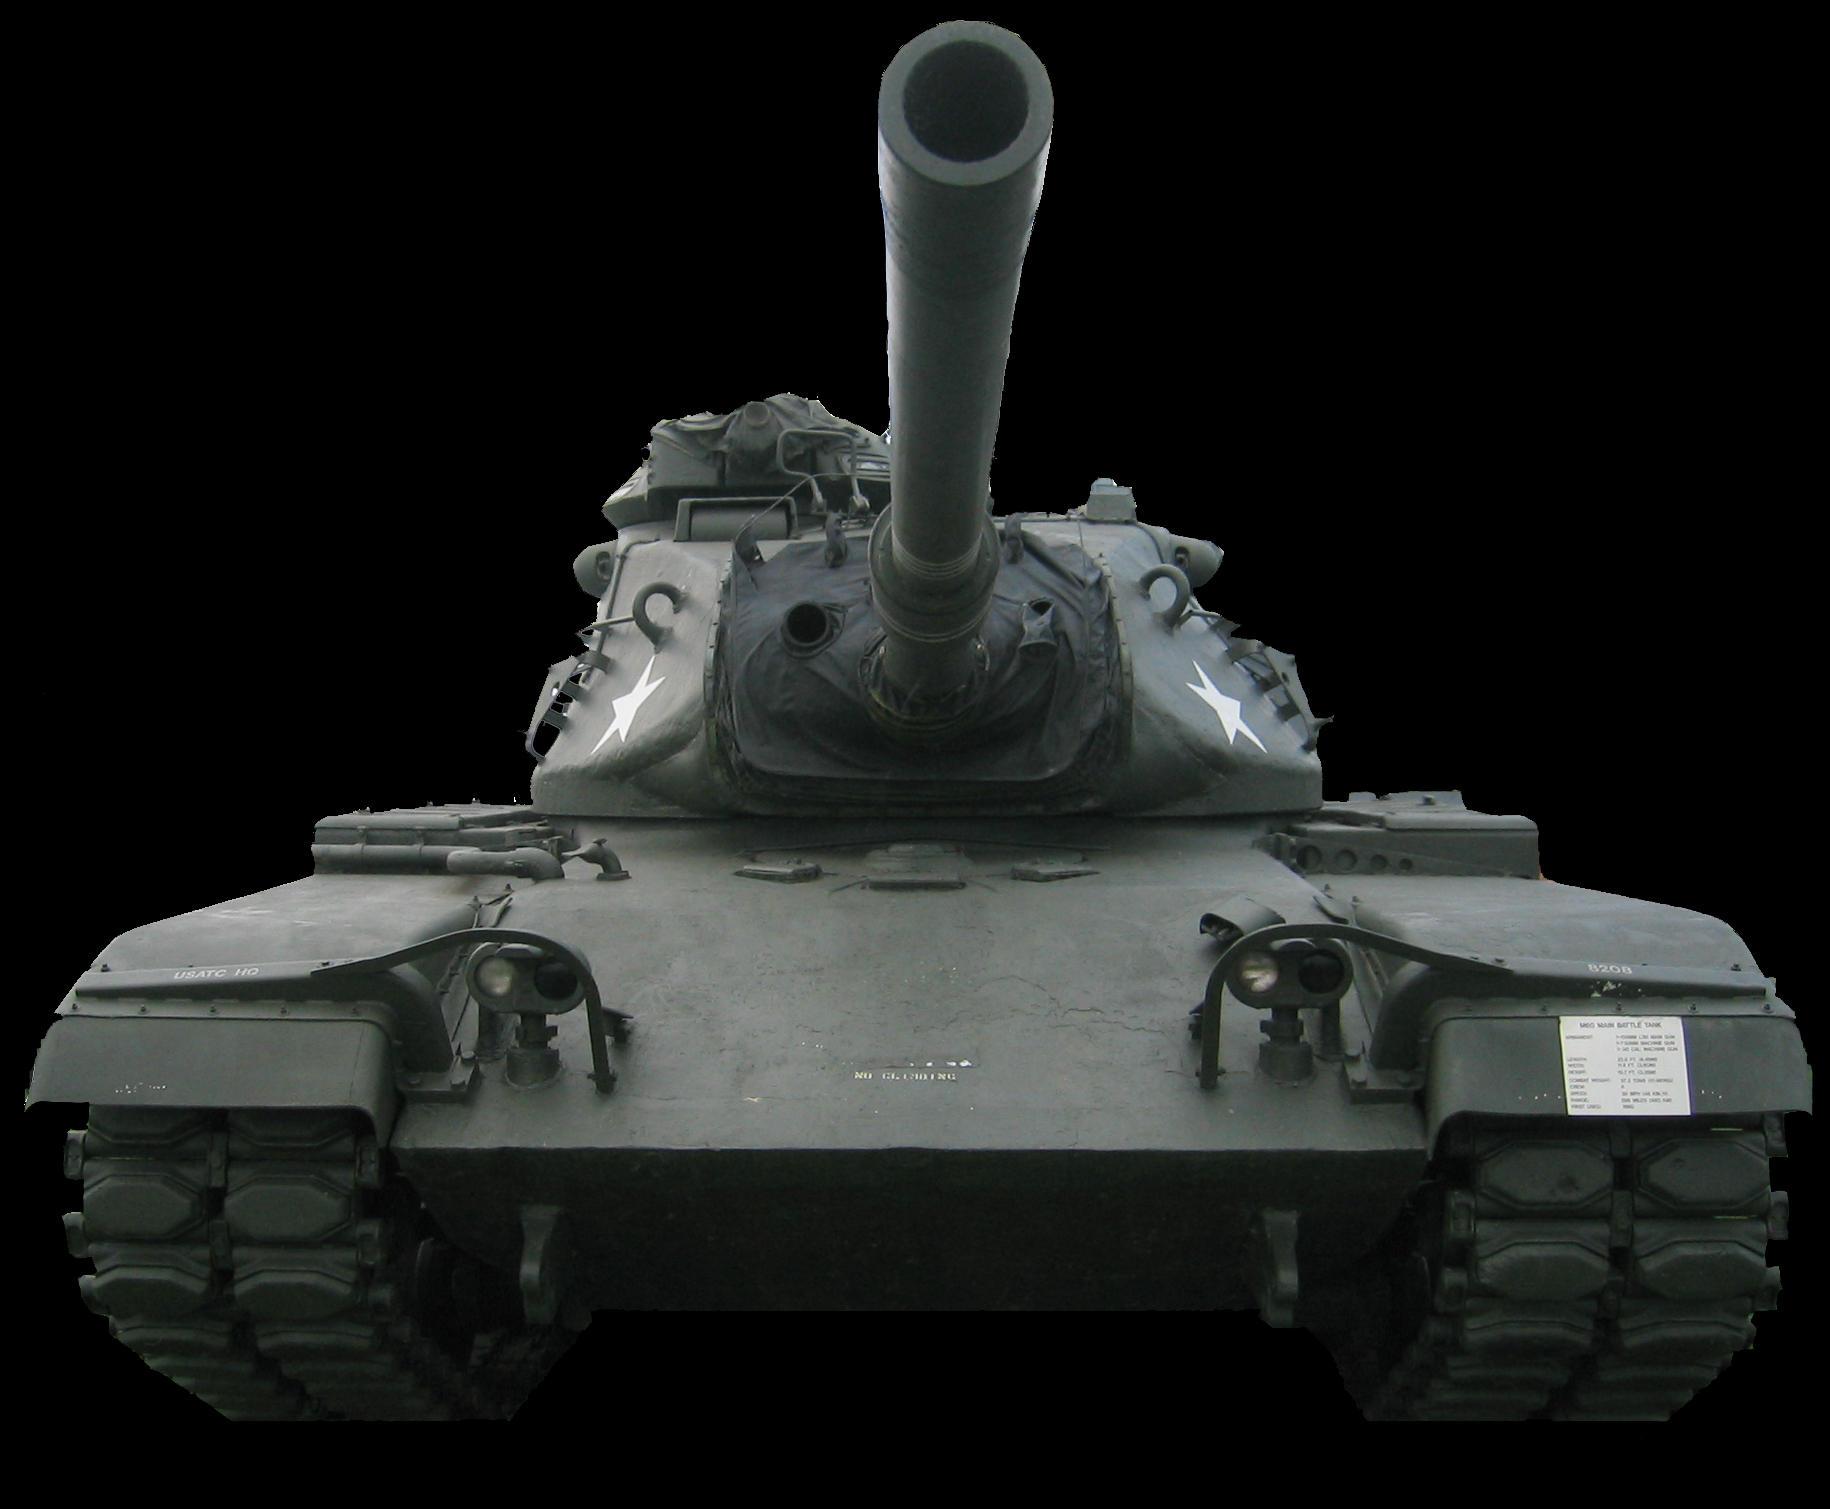 Tank on black by digitalhomicide